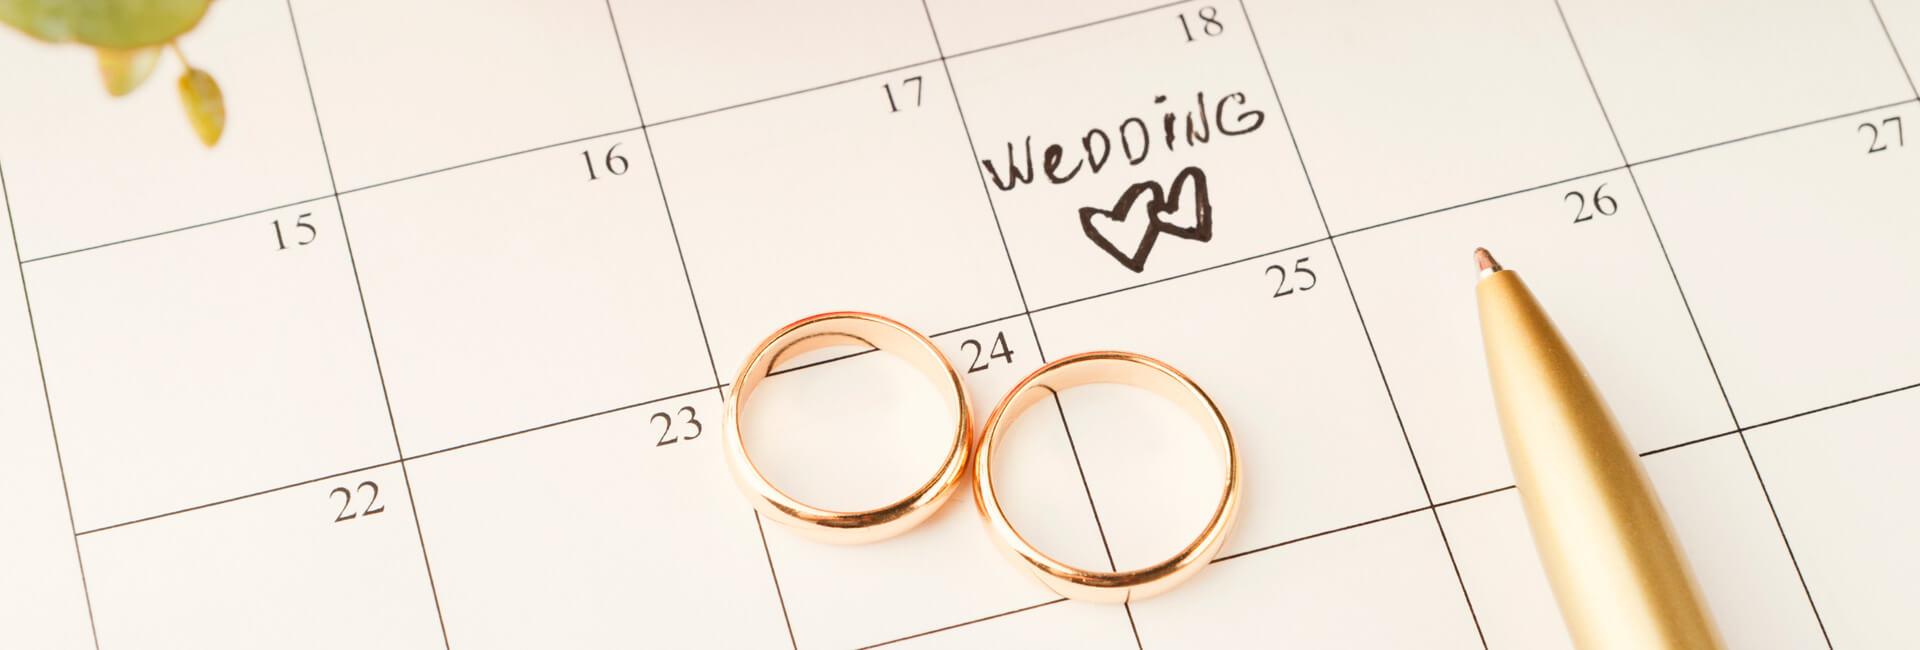 Wedding roles list